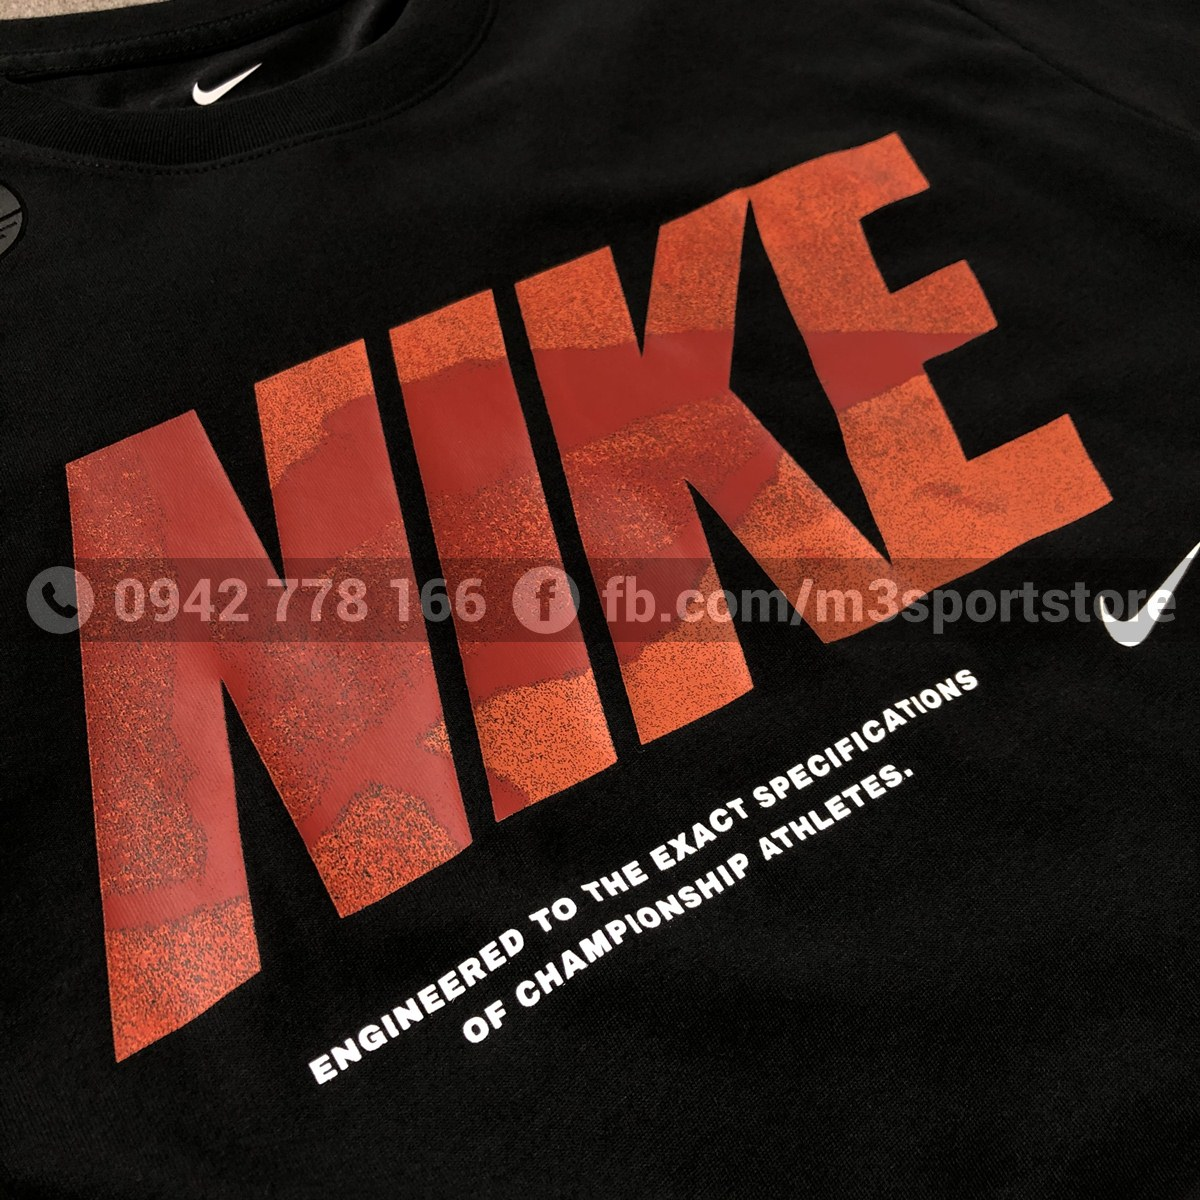 Áo thể thao nam Nike Dri-FIT Men's Graphic Training DA1765